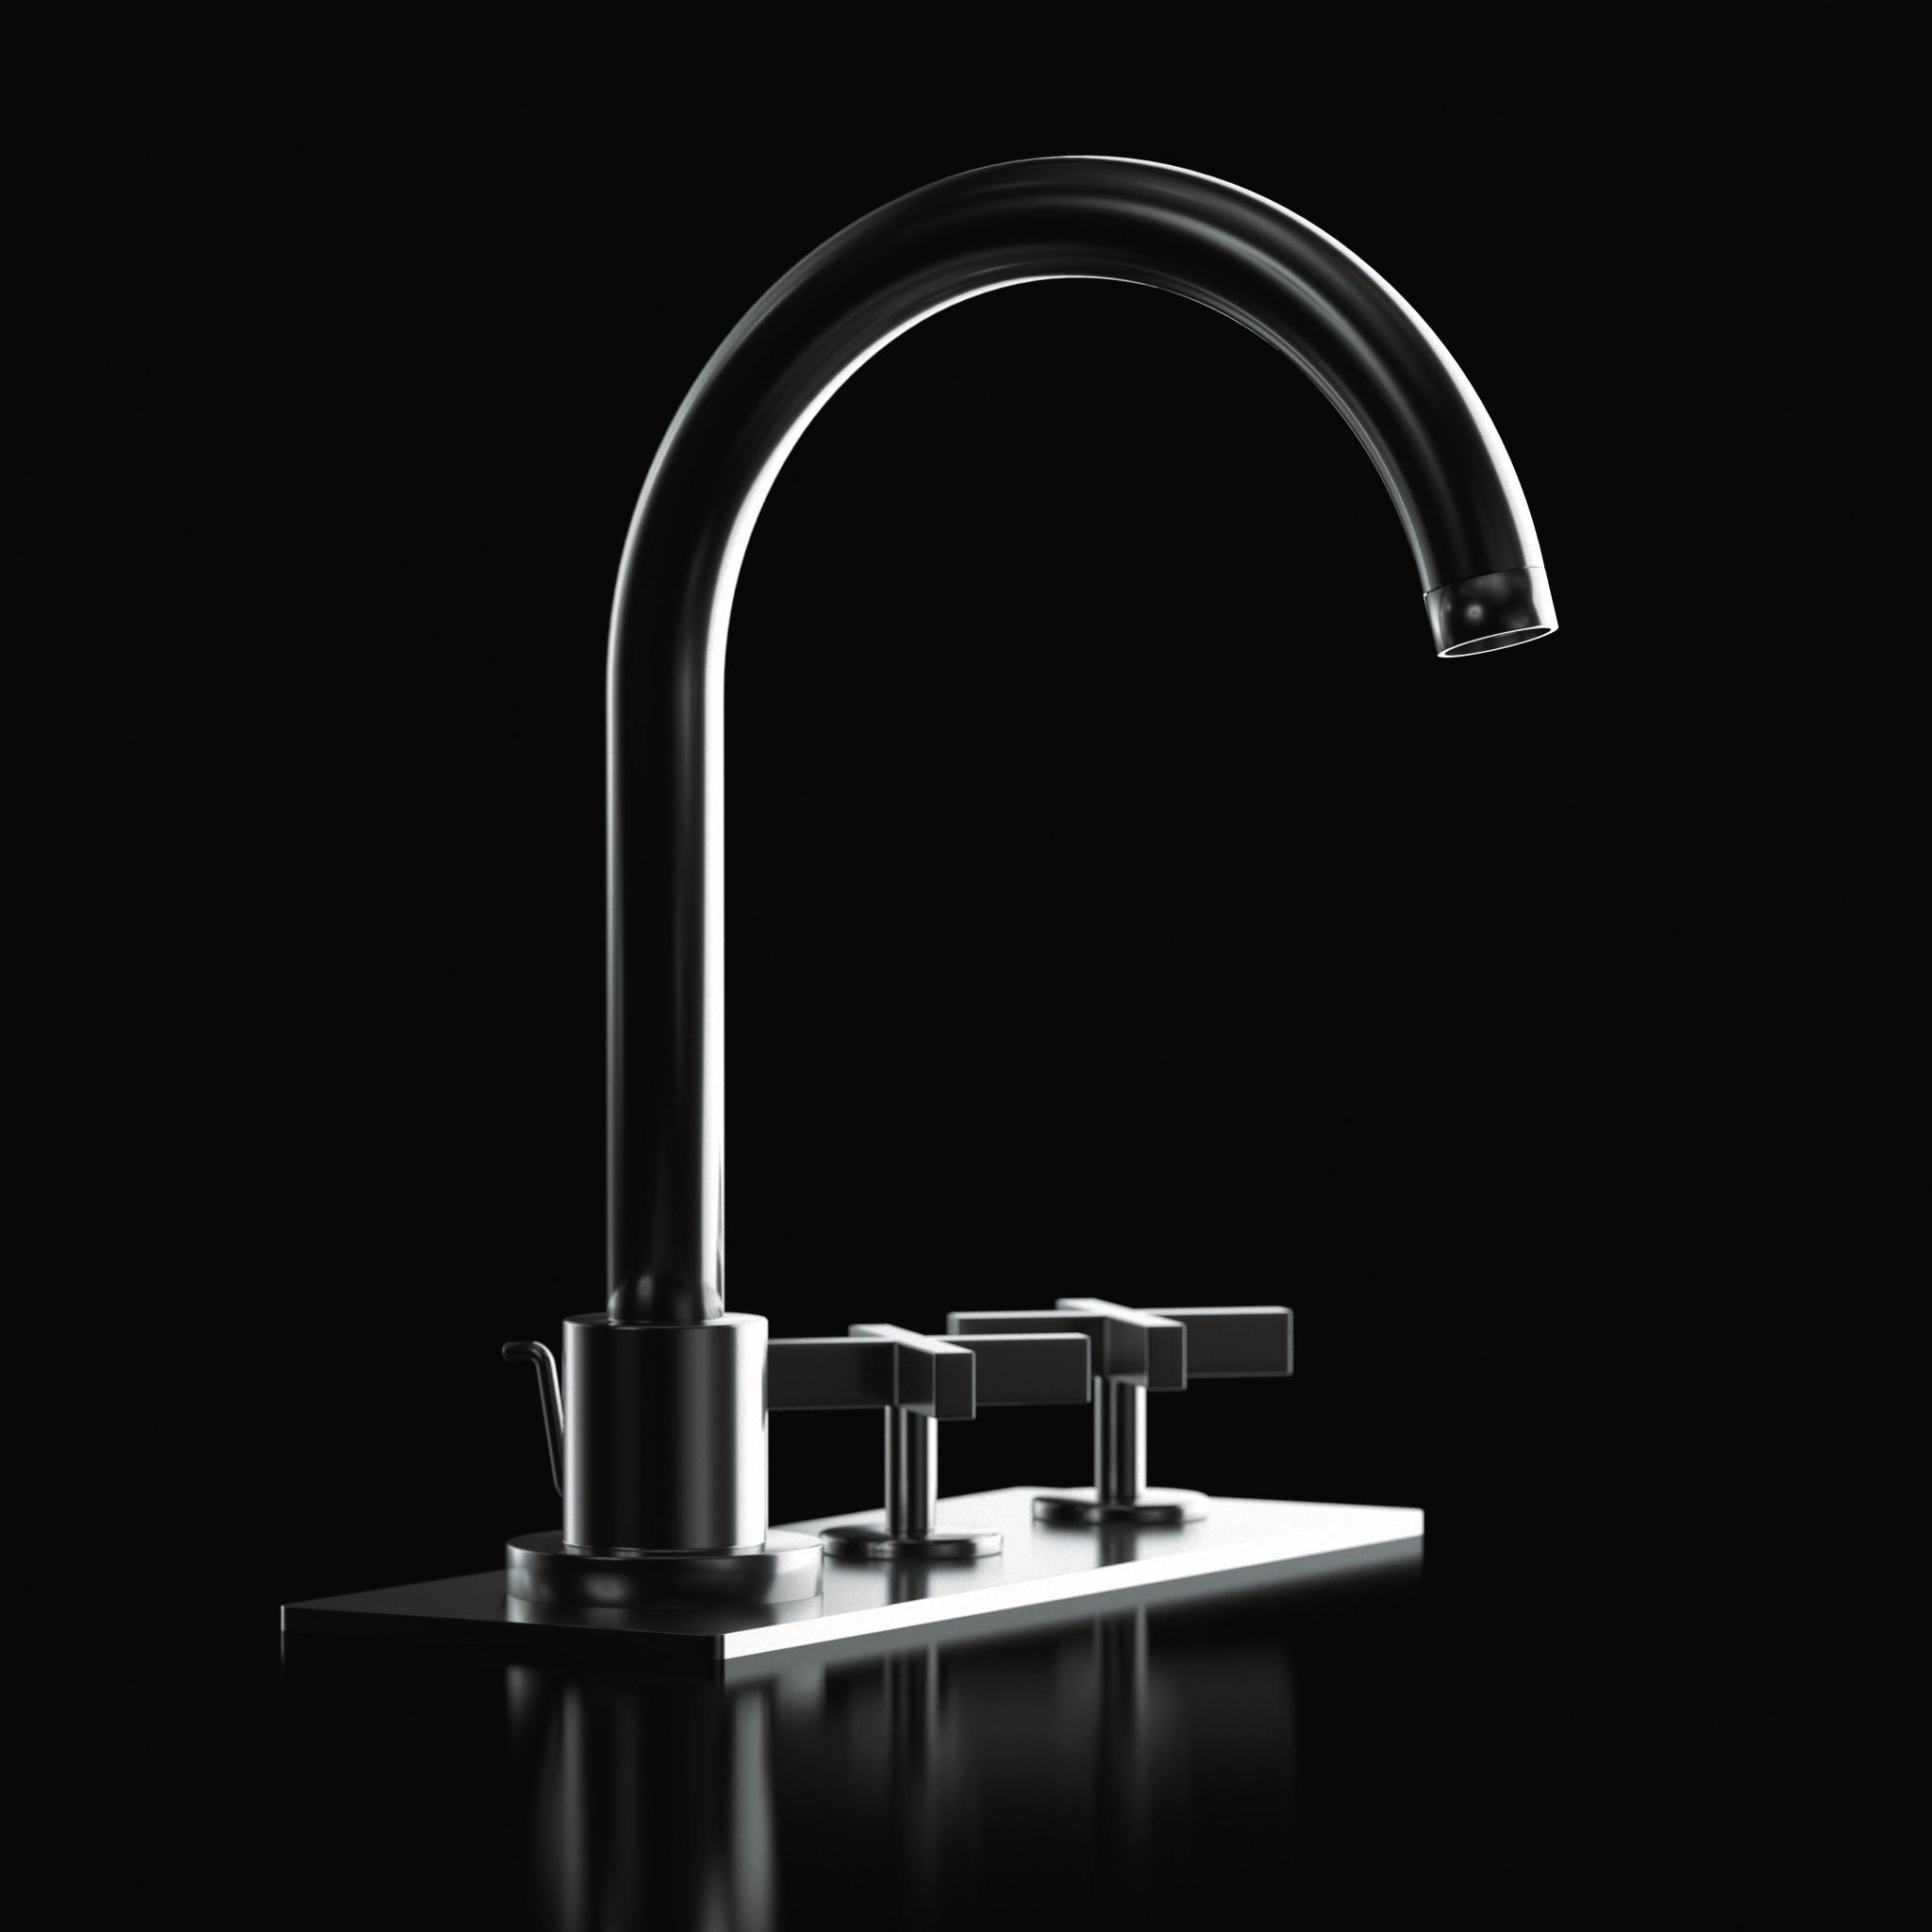 kitchen_sink_faucet_wide_1.jpg